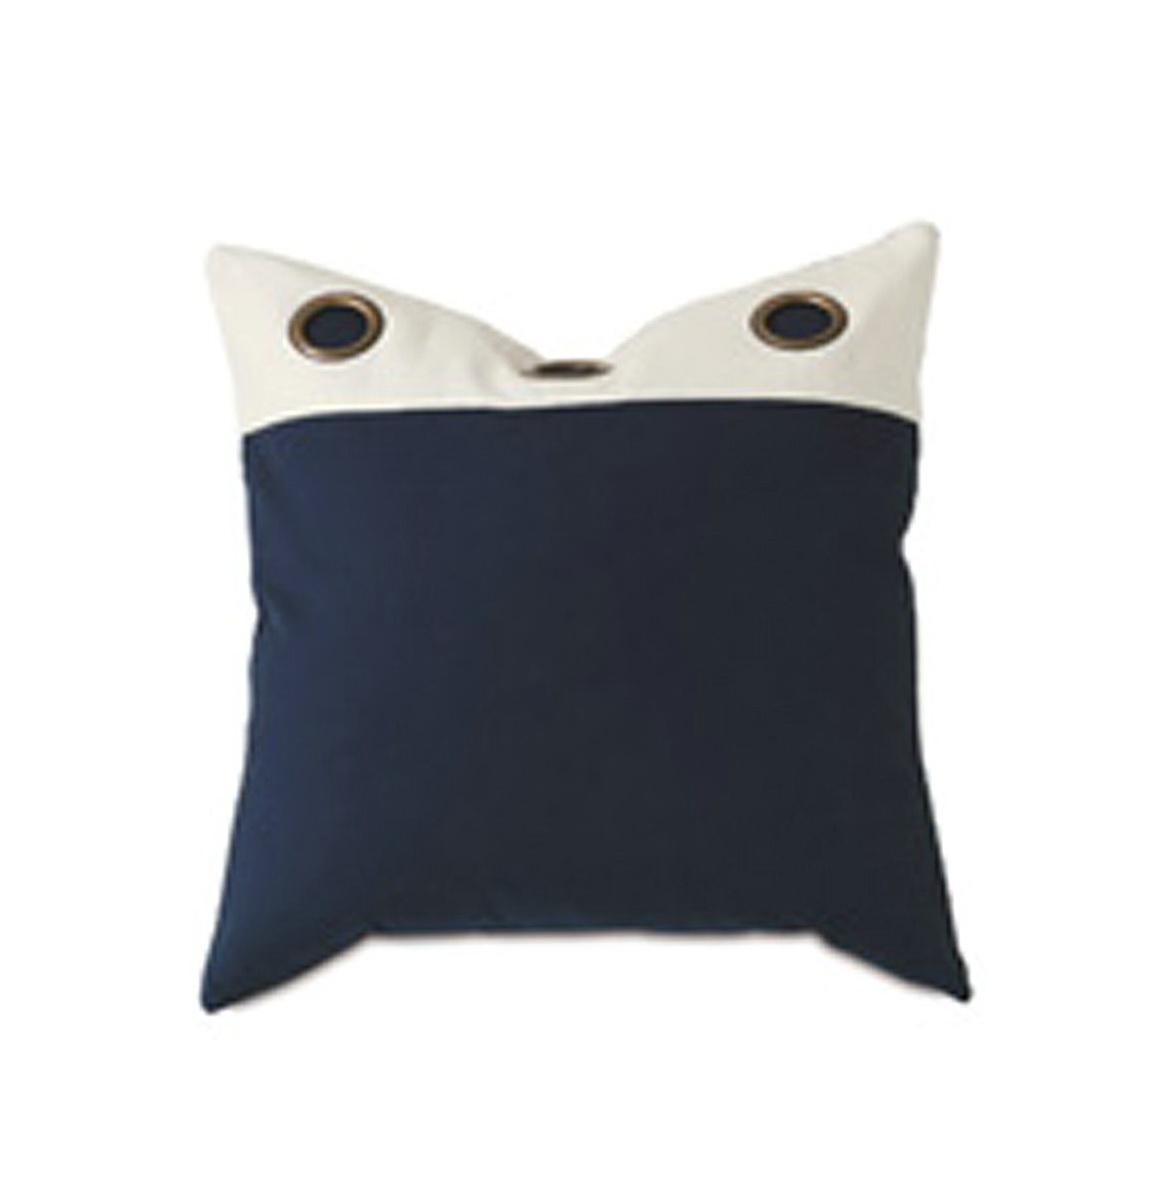 Sunbrella Outdoor Cushions 24x24